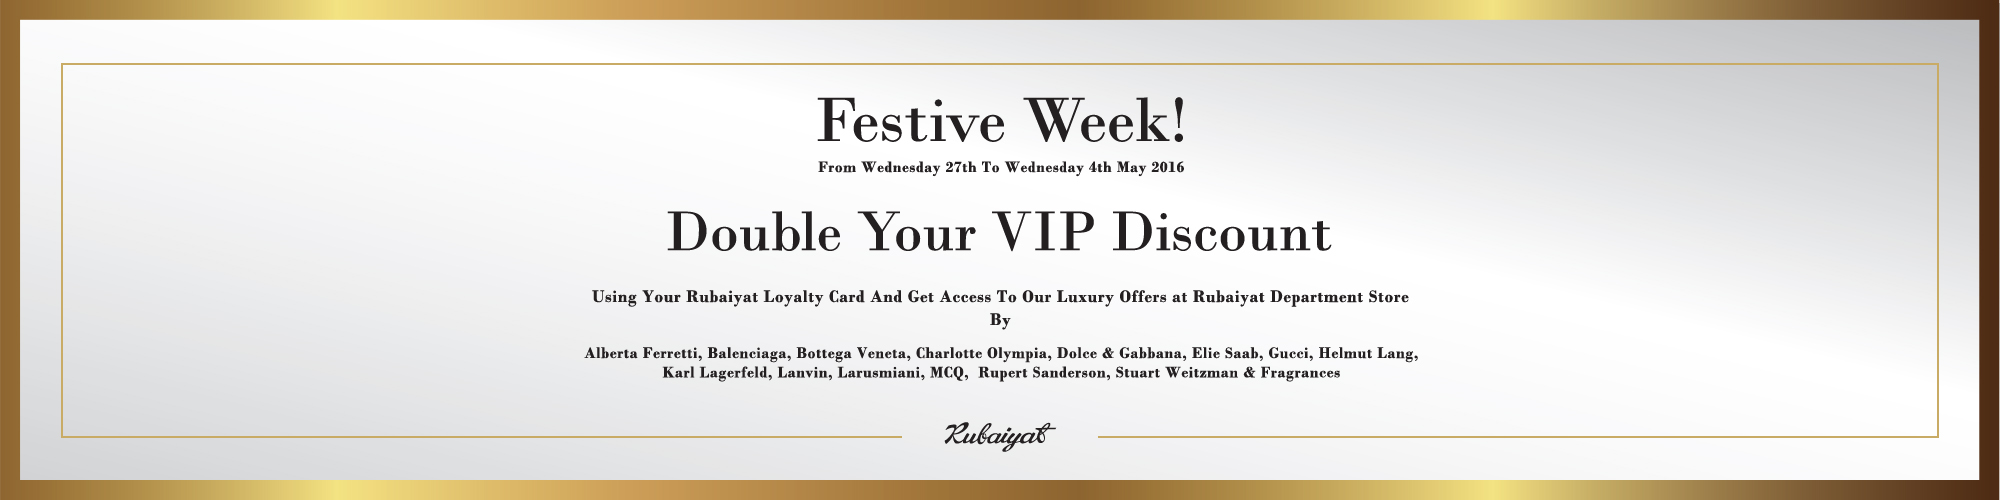 Festive-Week-Rubaiyat-web-banner